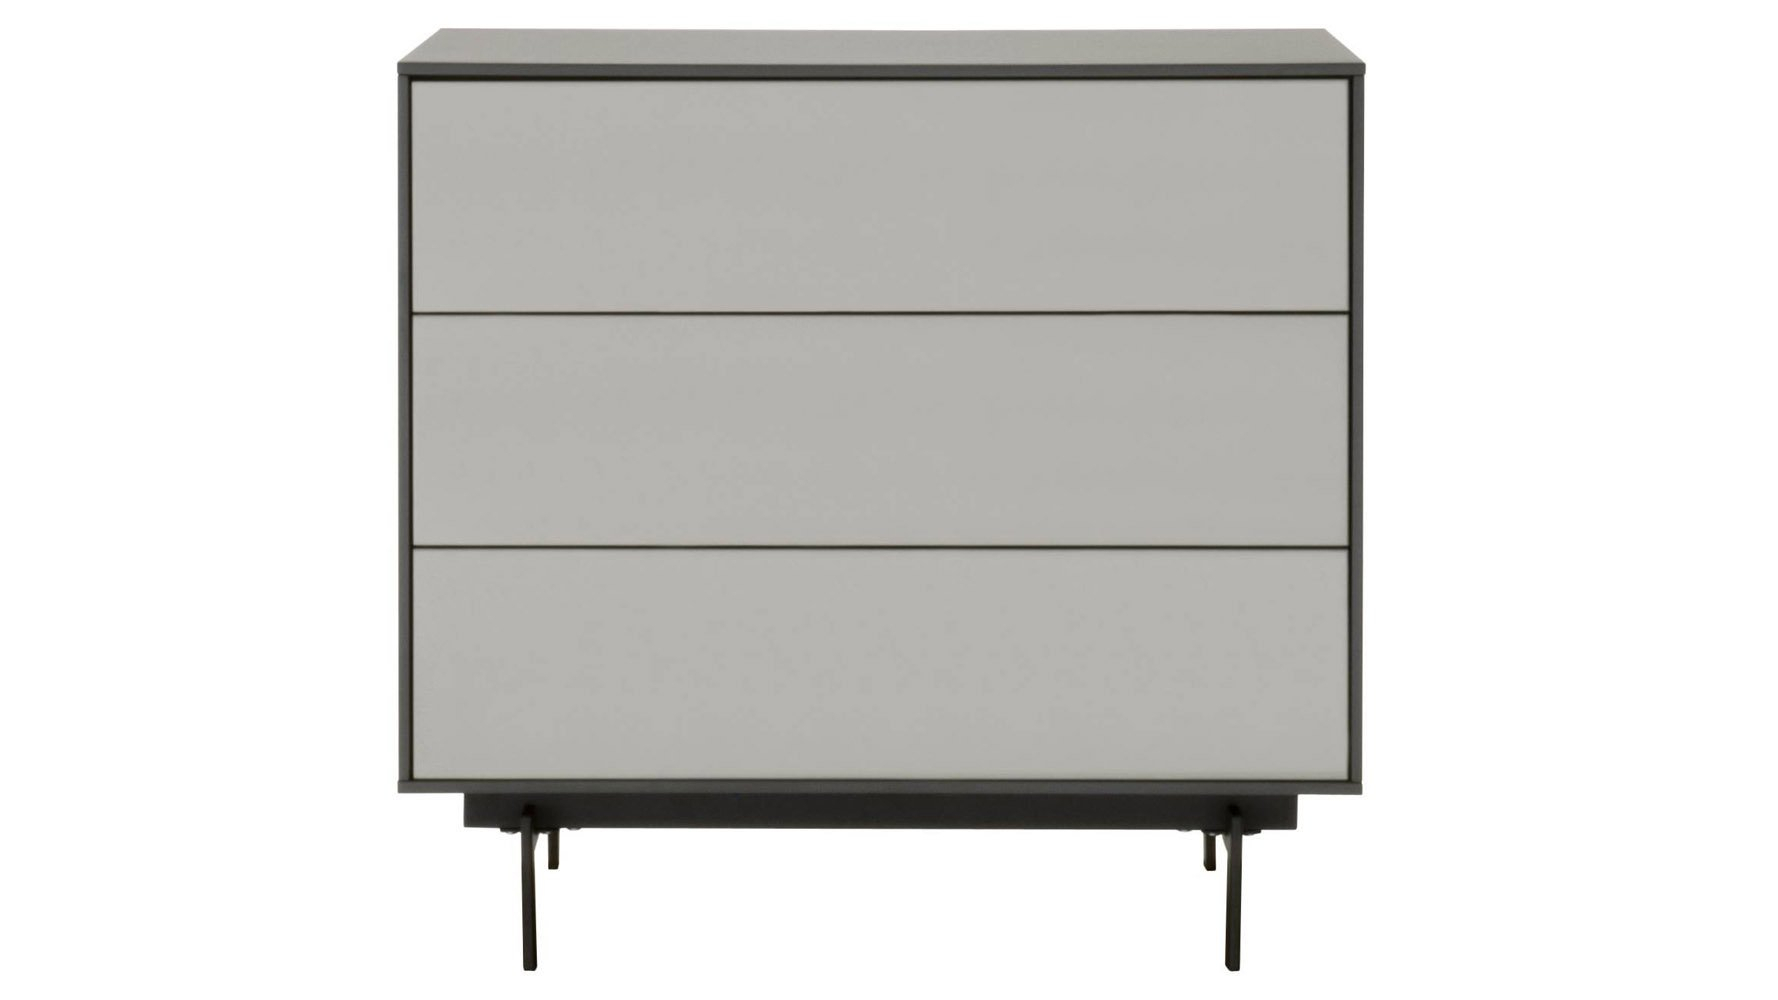 Cenny 3-Drawer Modular Storage Unit - High for 3-Drawer Black Storage Buffets (Image 14 of 30)